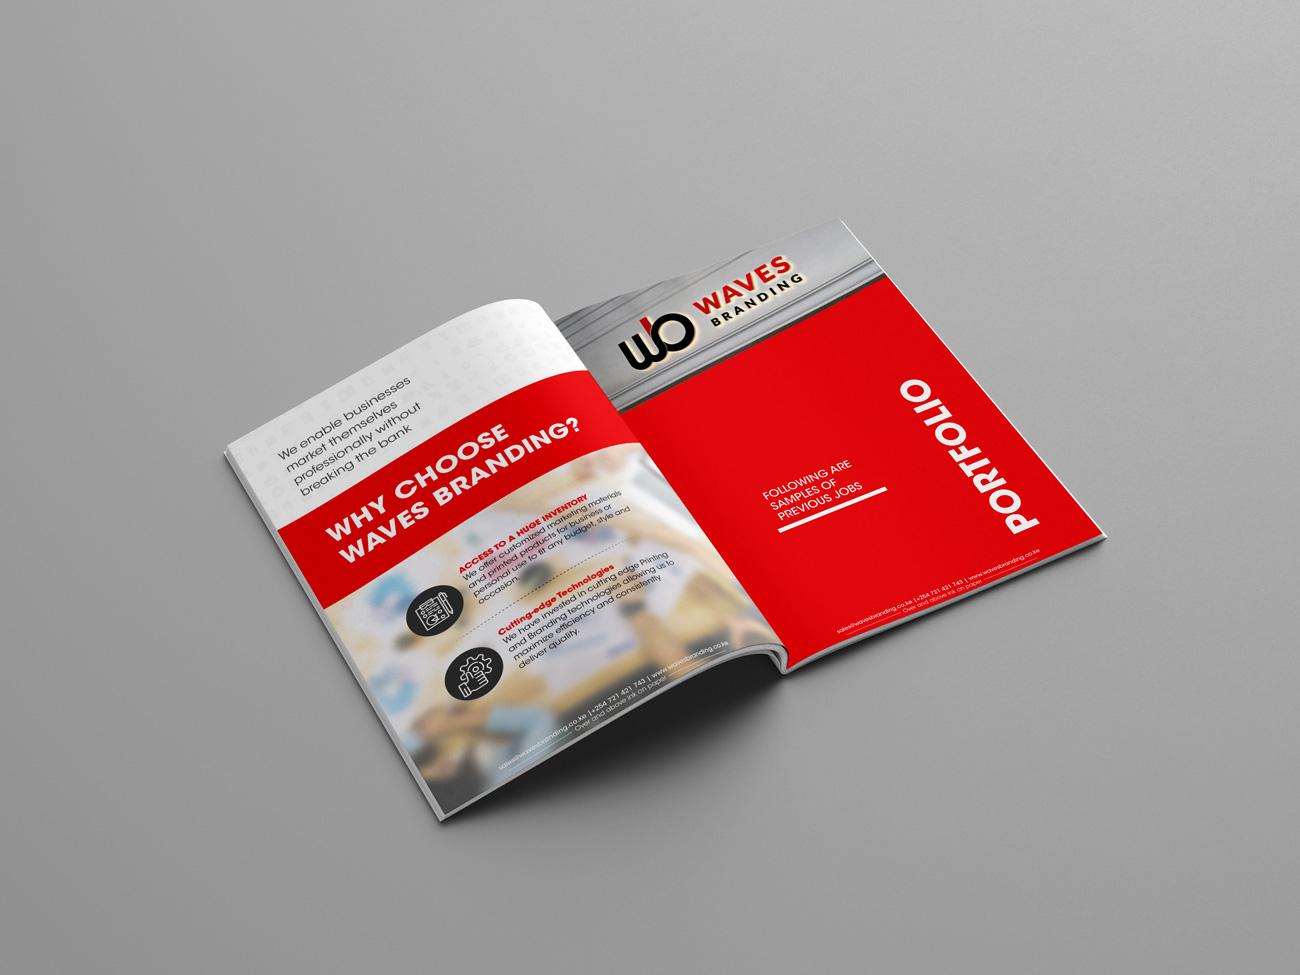 https://www.manjemedia.com/project/waves-branding-company-profile-development/